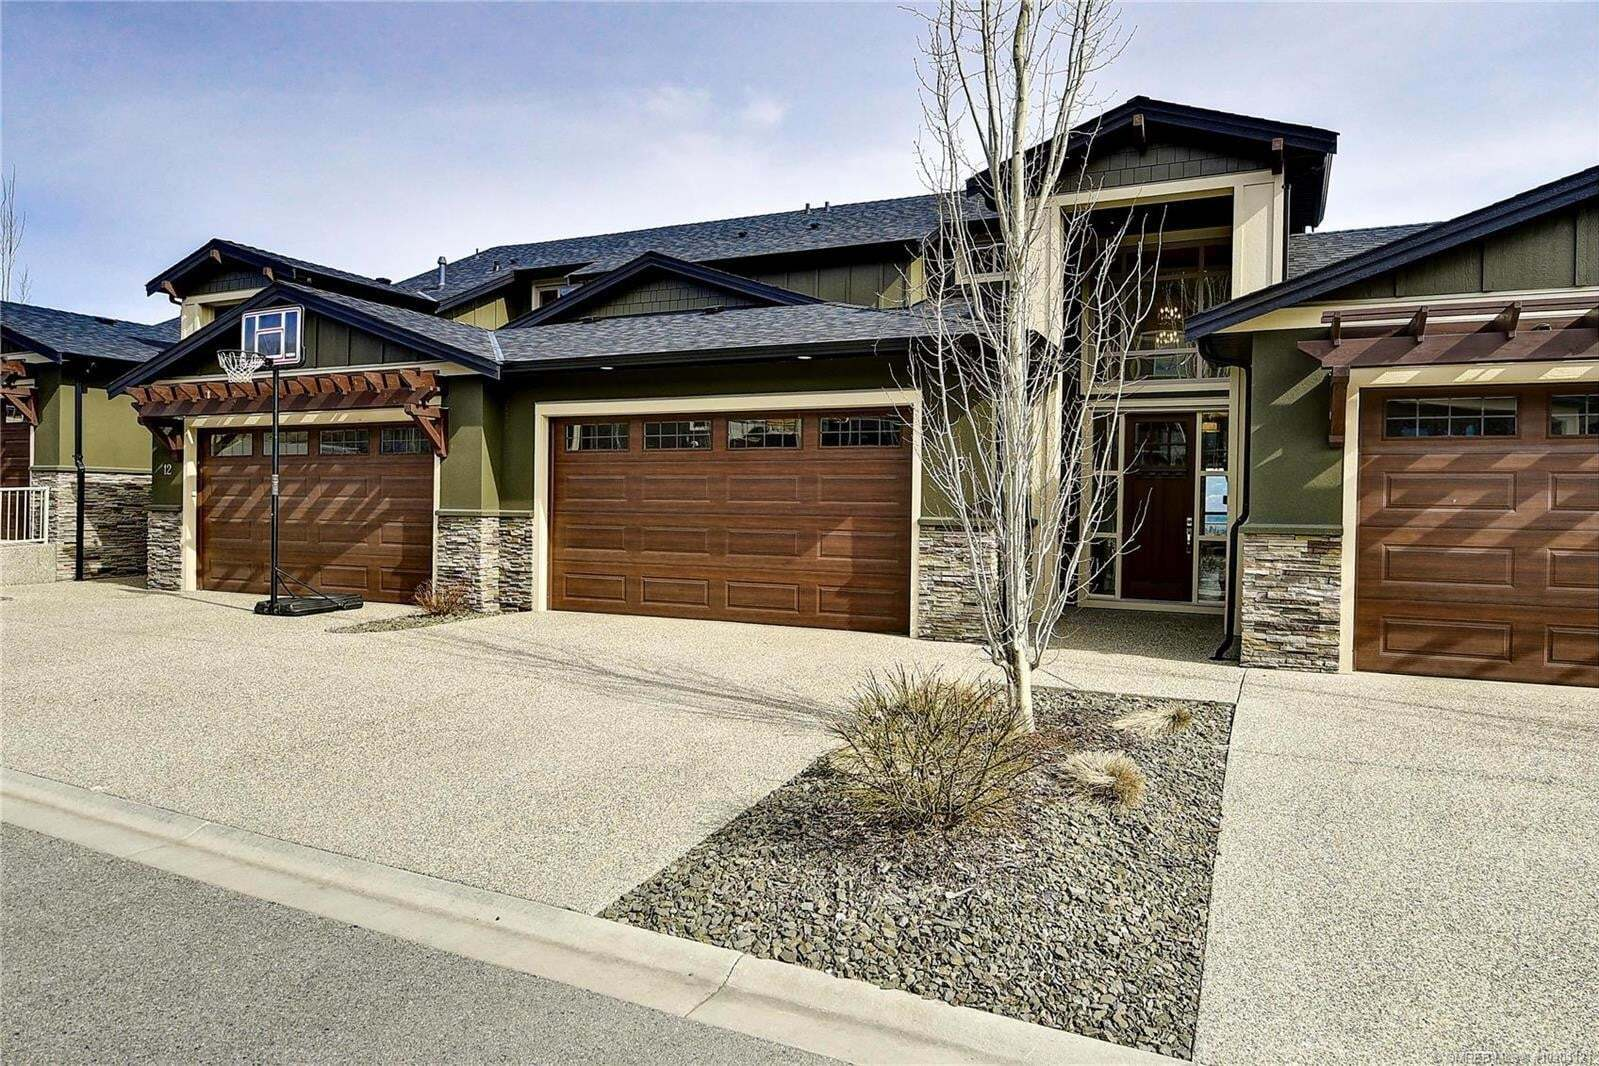 Townhouse for sale at 1870 Rosealee Ln West Kelowna British Columbia - MLS: 10204121